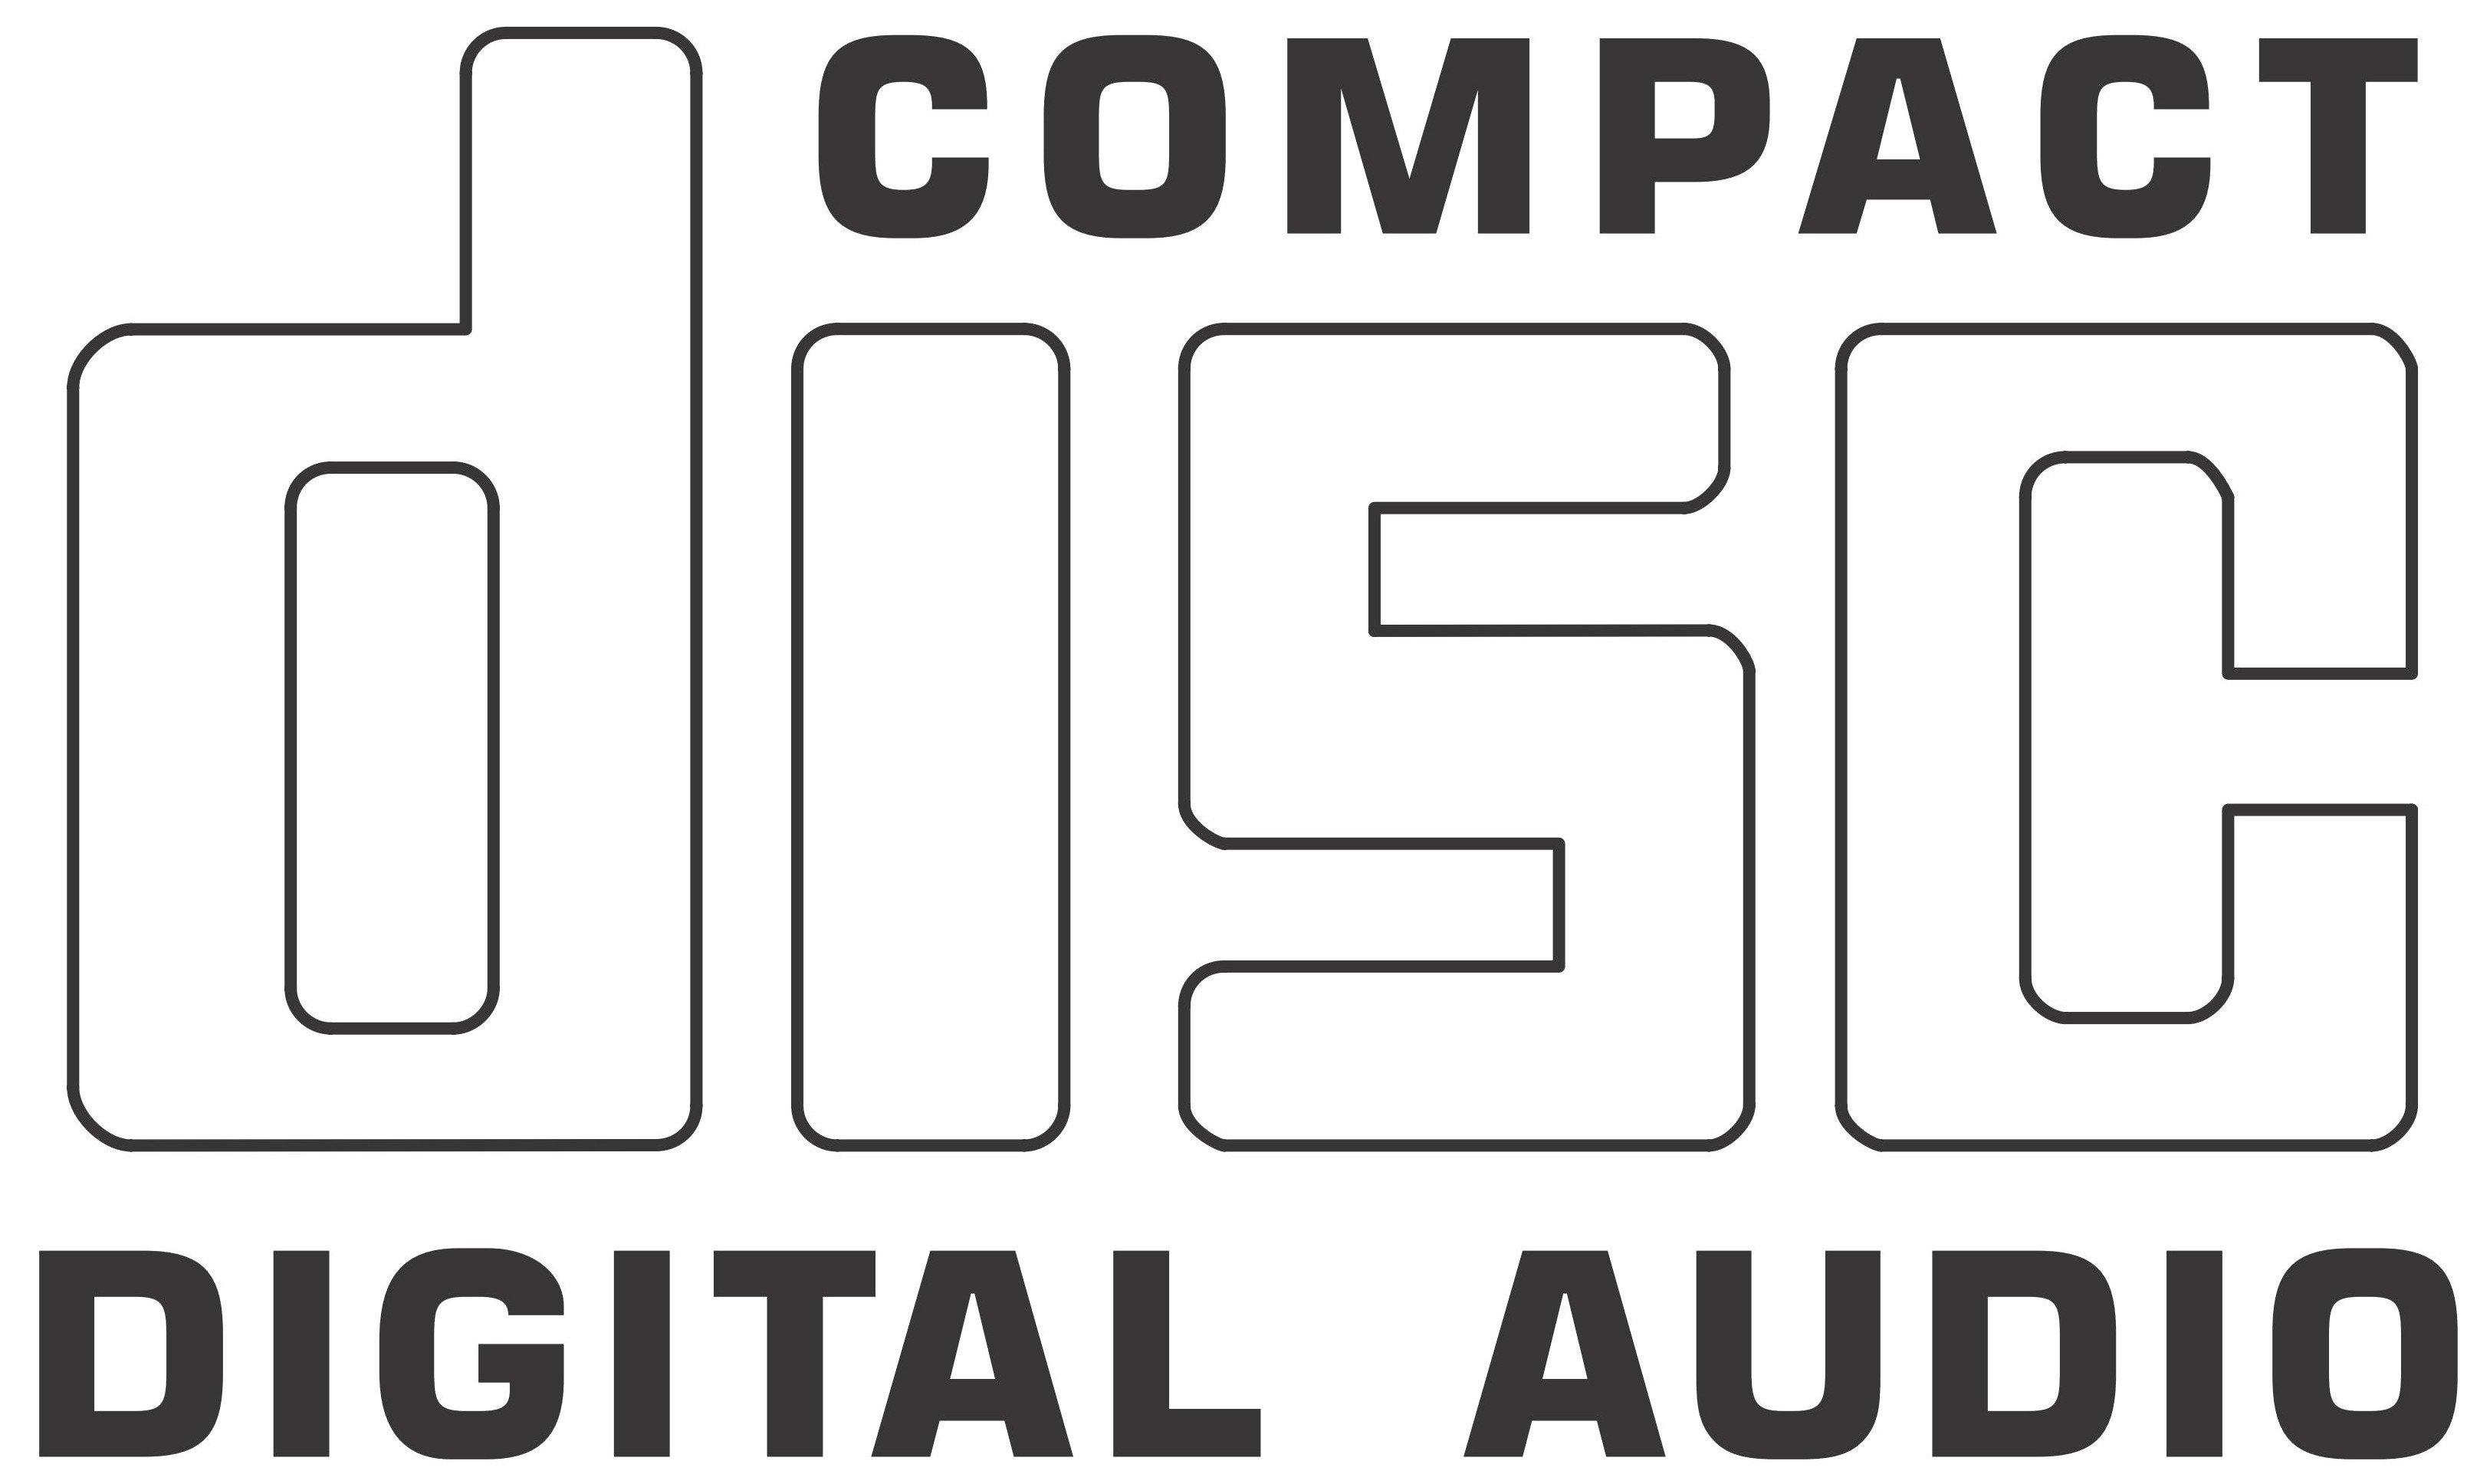 CD-Audio Logo [Compact Disc Digital Audio] Vector EPS Free Download, Logo, Icons, Brand Emblems